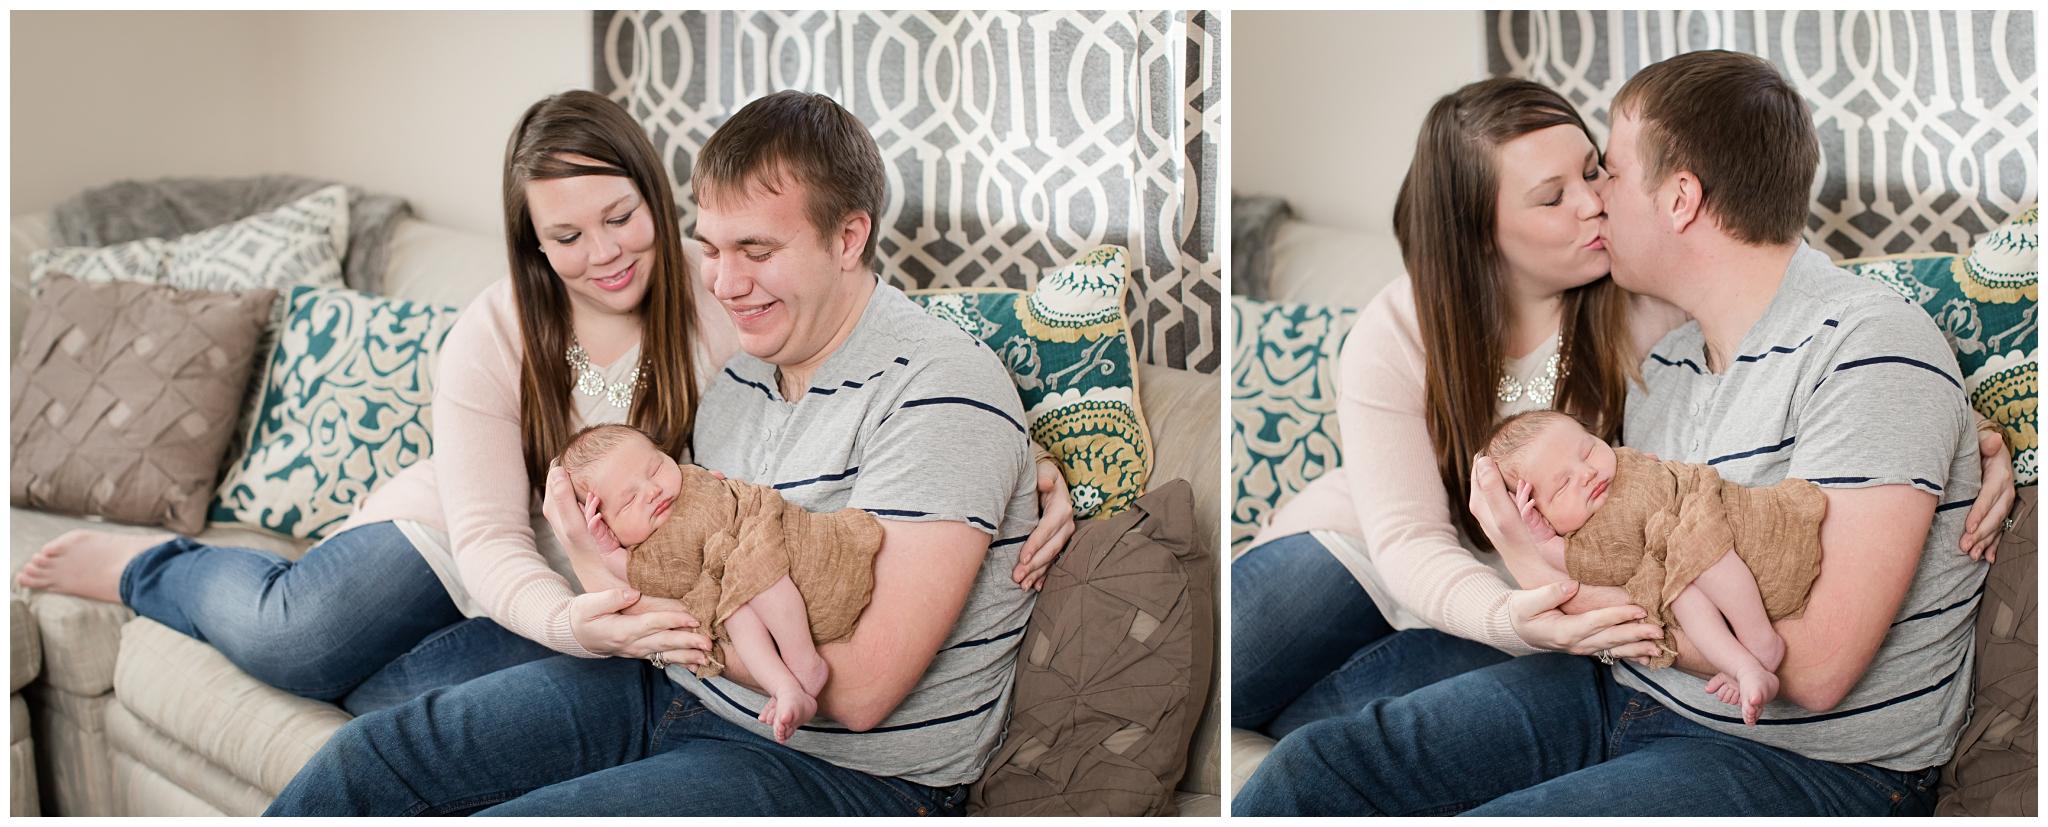 ChristmasMiniSessions_family-baby-kids_Berks-County-Reading-PA_0063.jpg